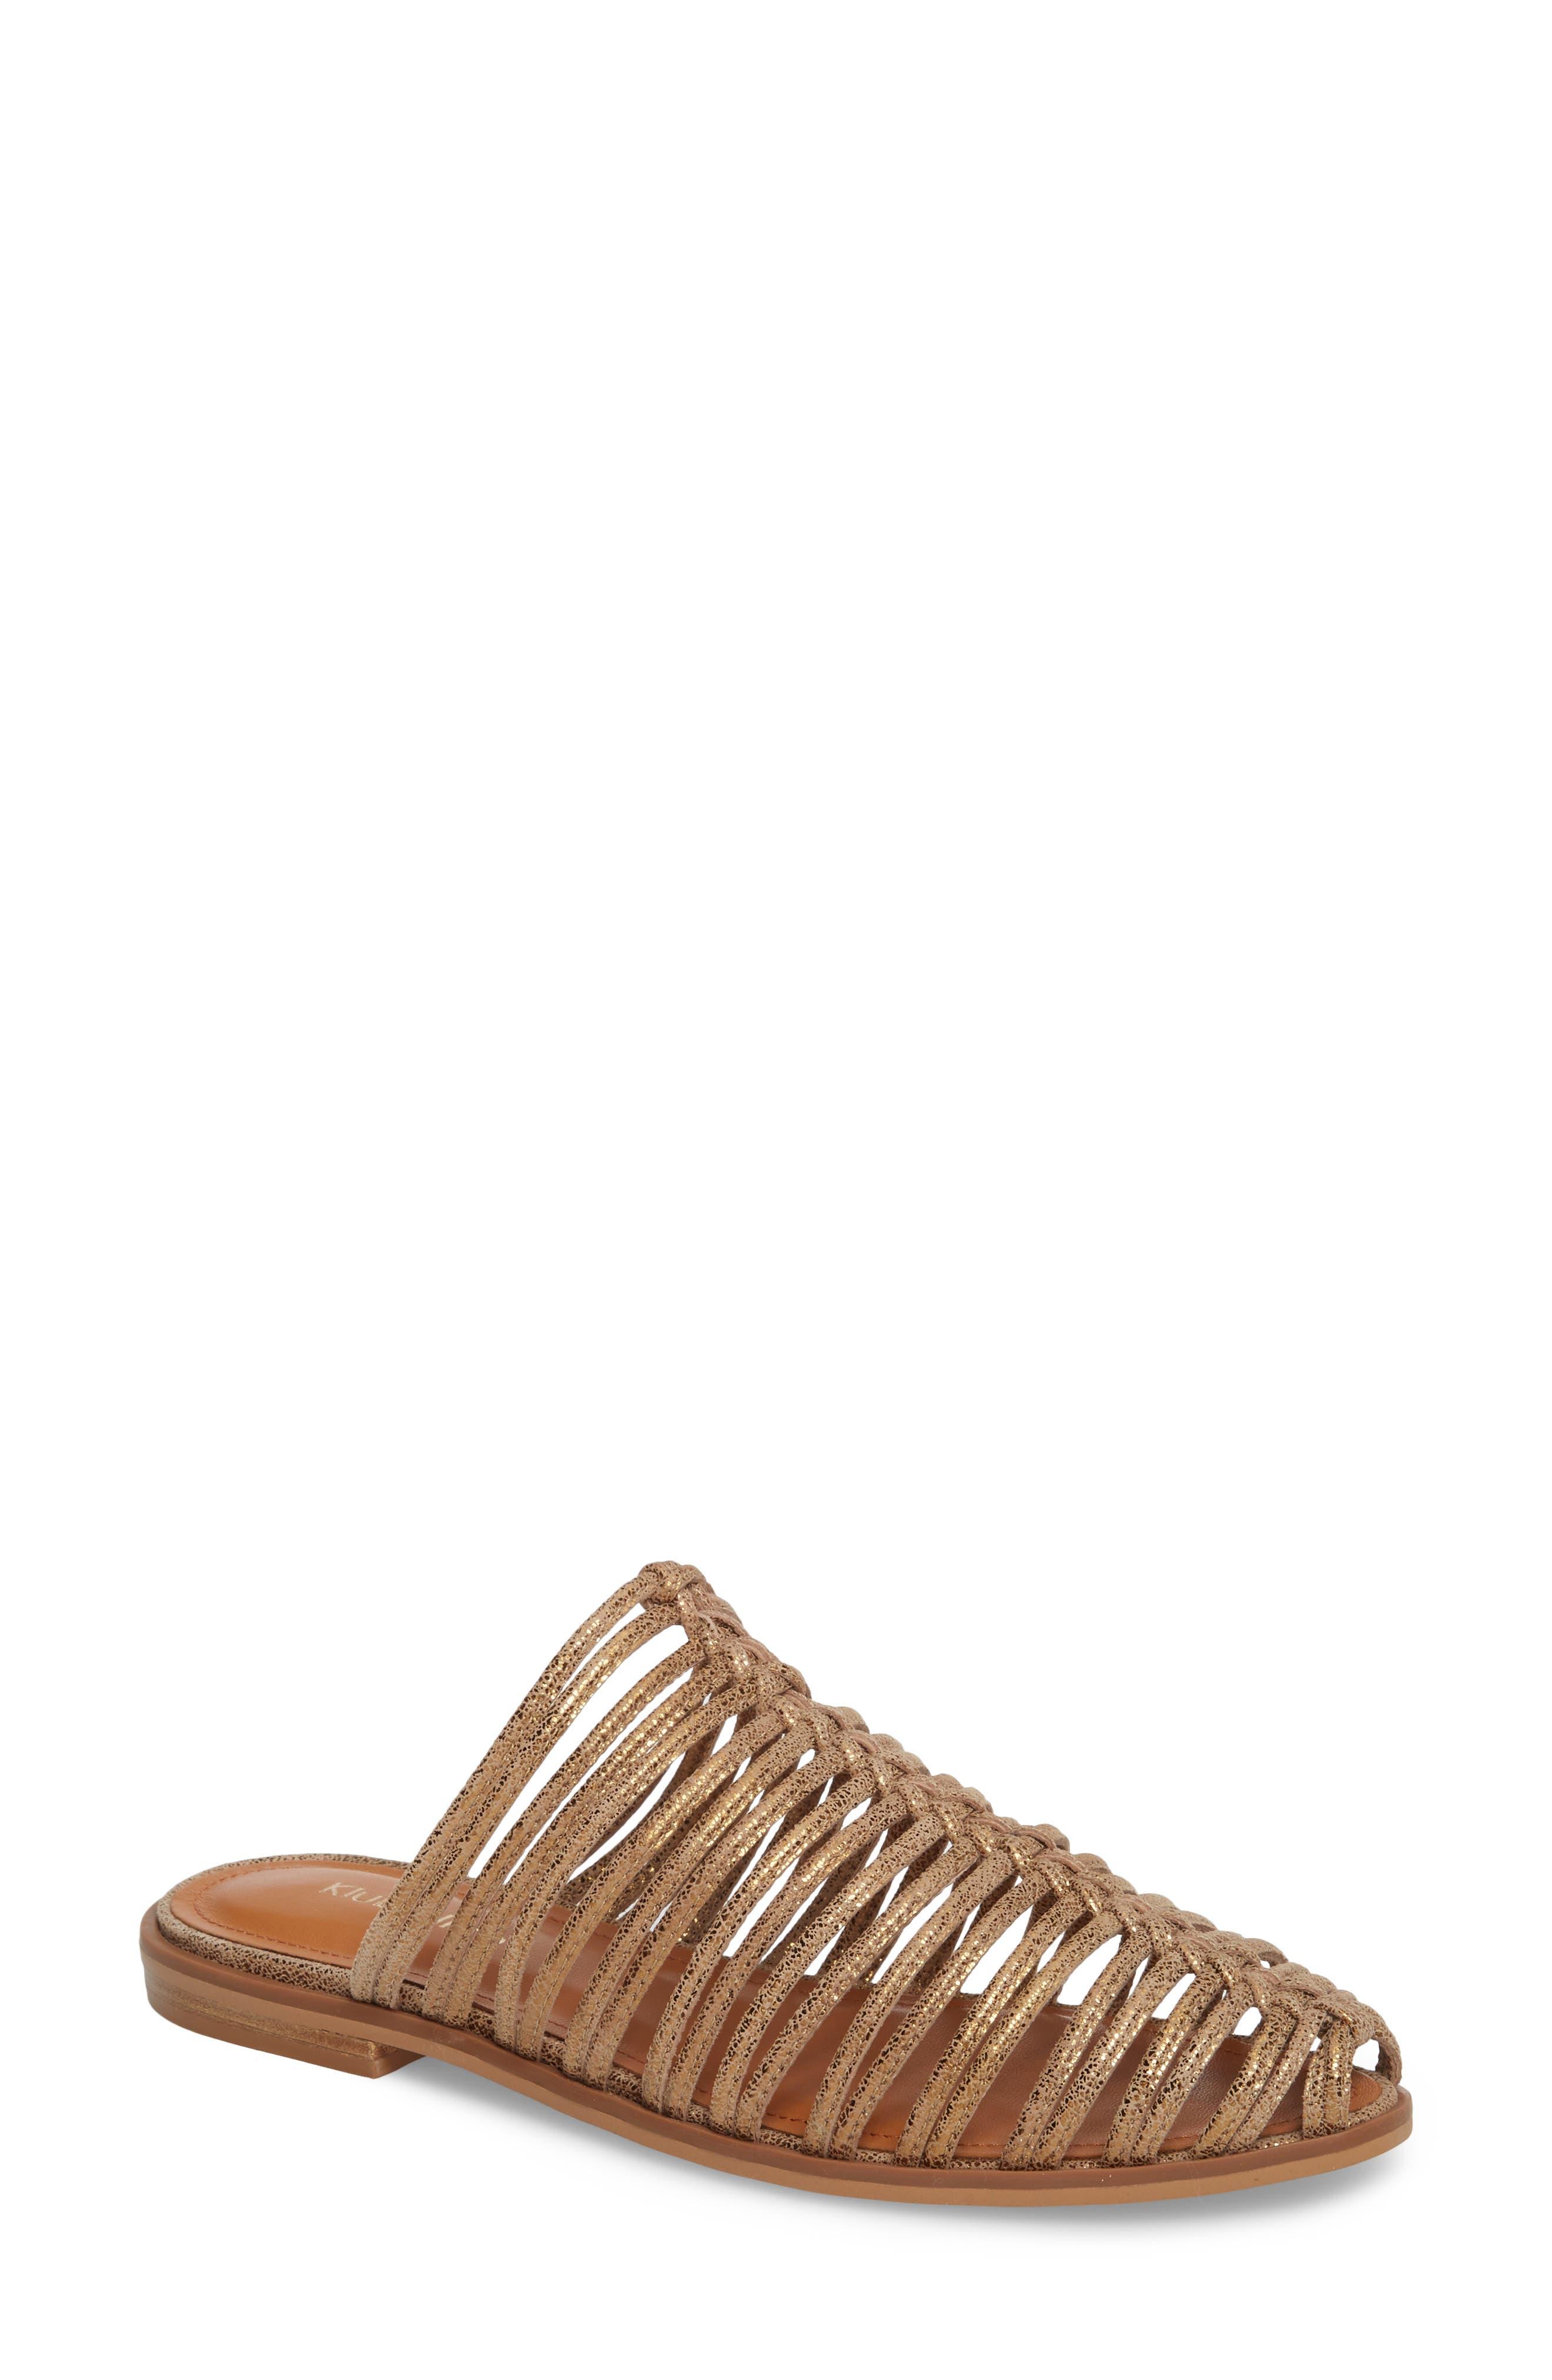 Geonna Sandal,                         Main,                         color, 220